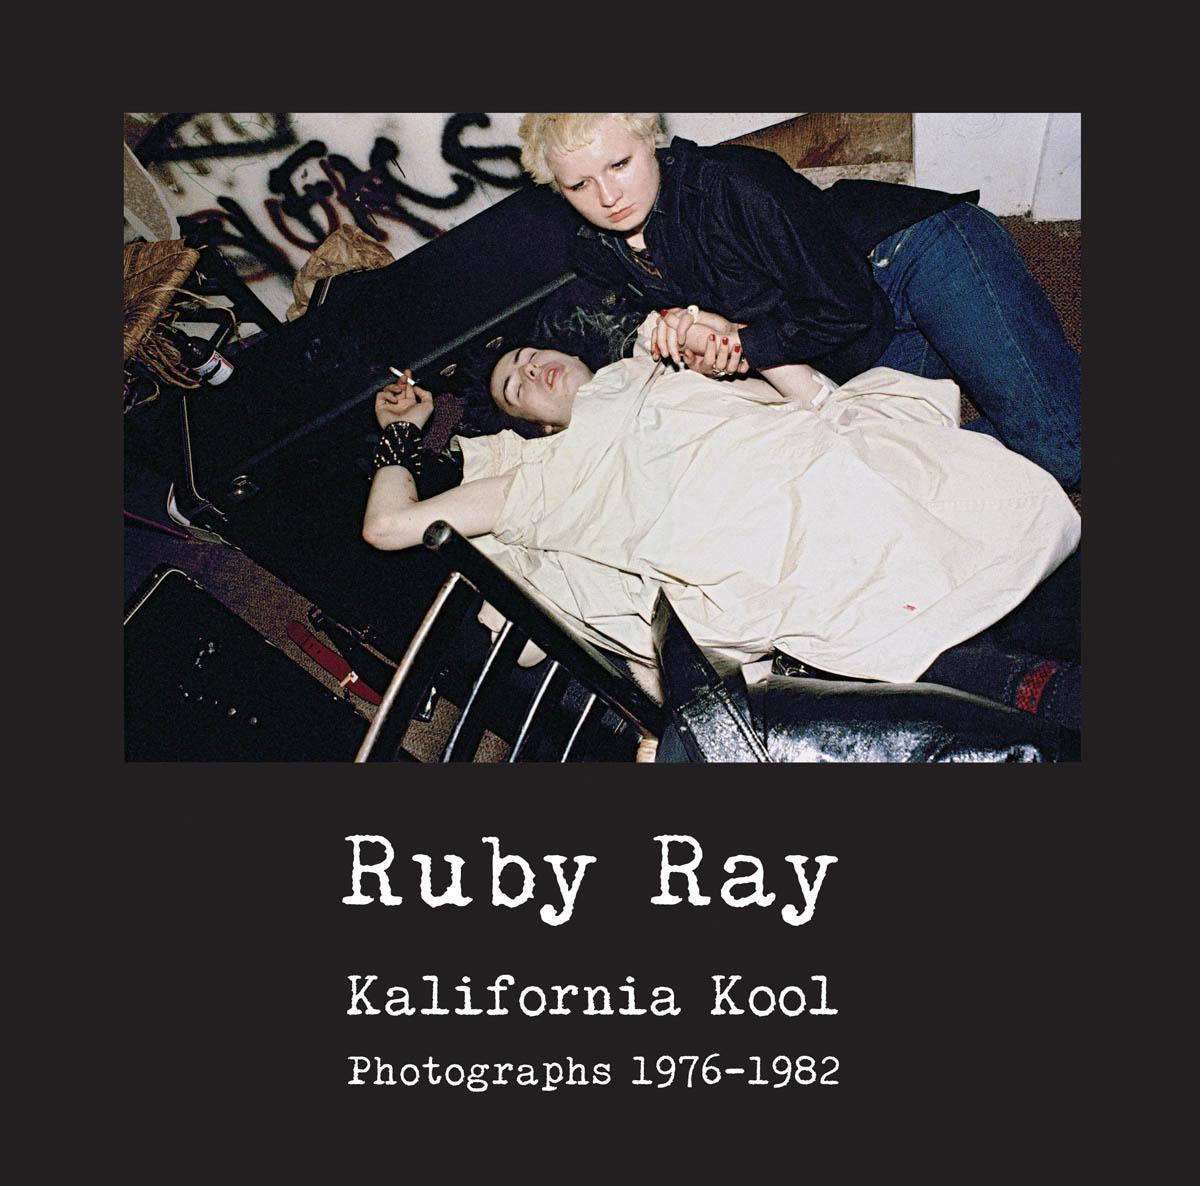 ruby-ray-kalifornia-kool-2